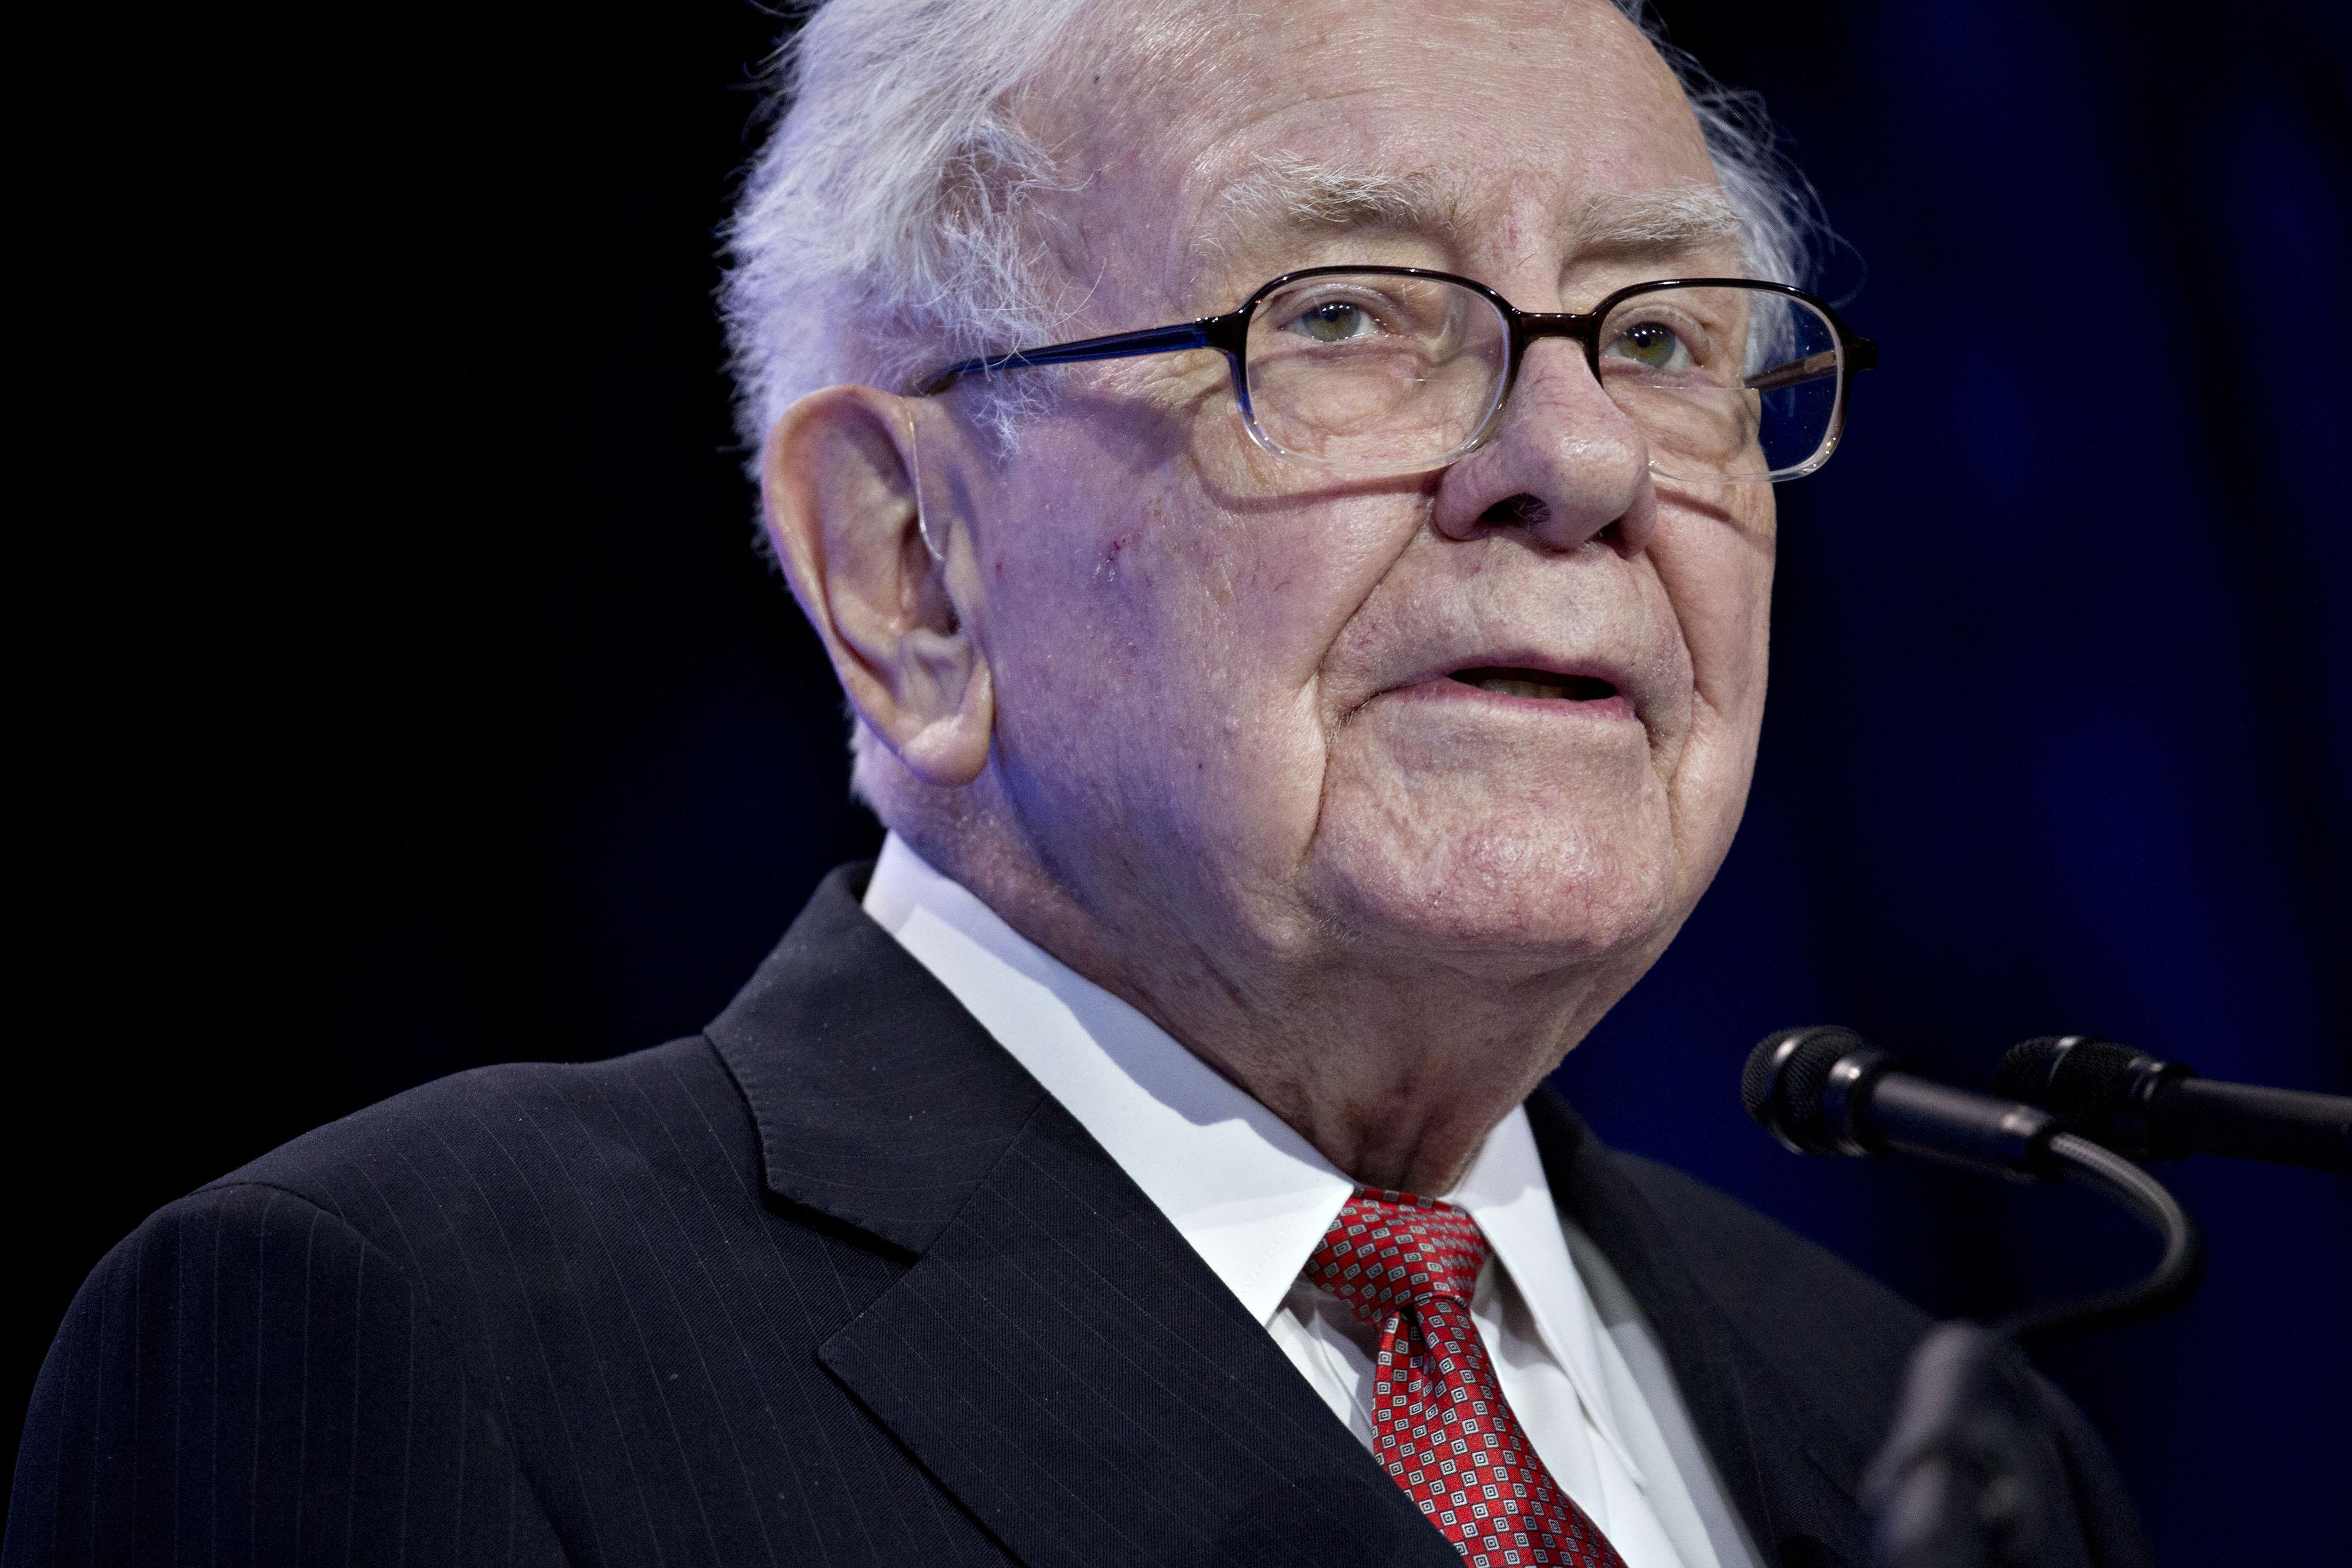 bloomberg.com - Andrew Blackman - Warren Buffett to Expand His Real Estate Empire to Milan, Dubai